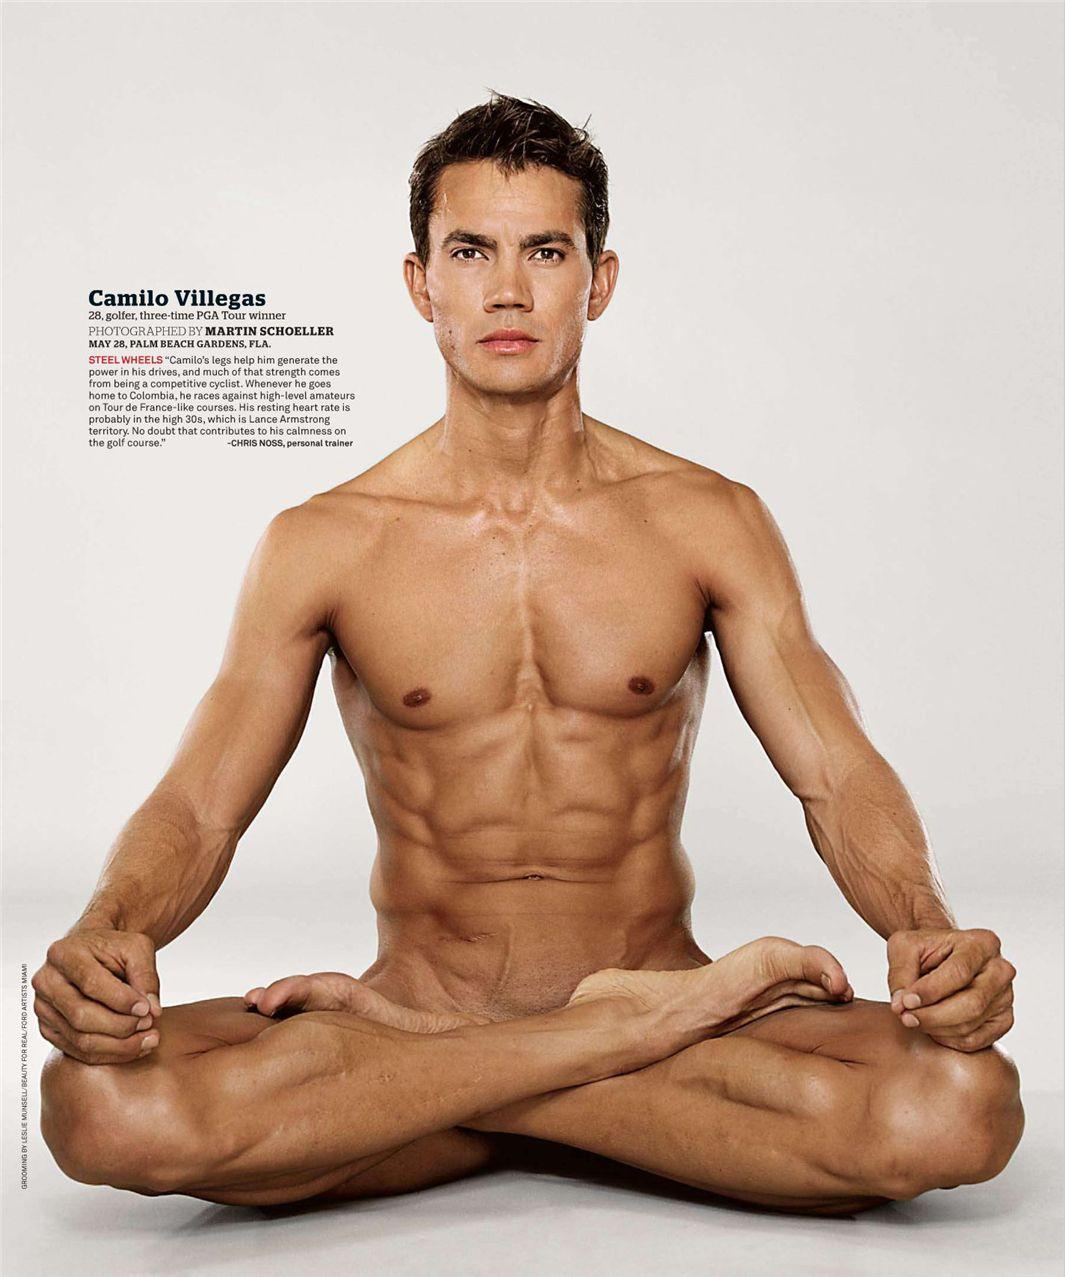 Камило Виллегас / Camilo Villegas - ESPN Magazine Body Issue 18 october 2010